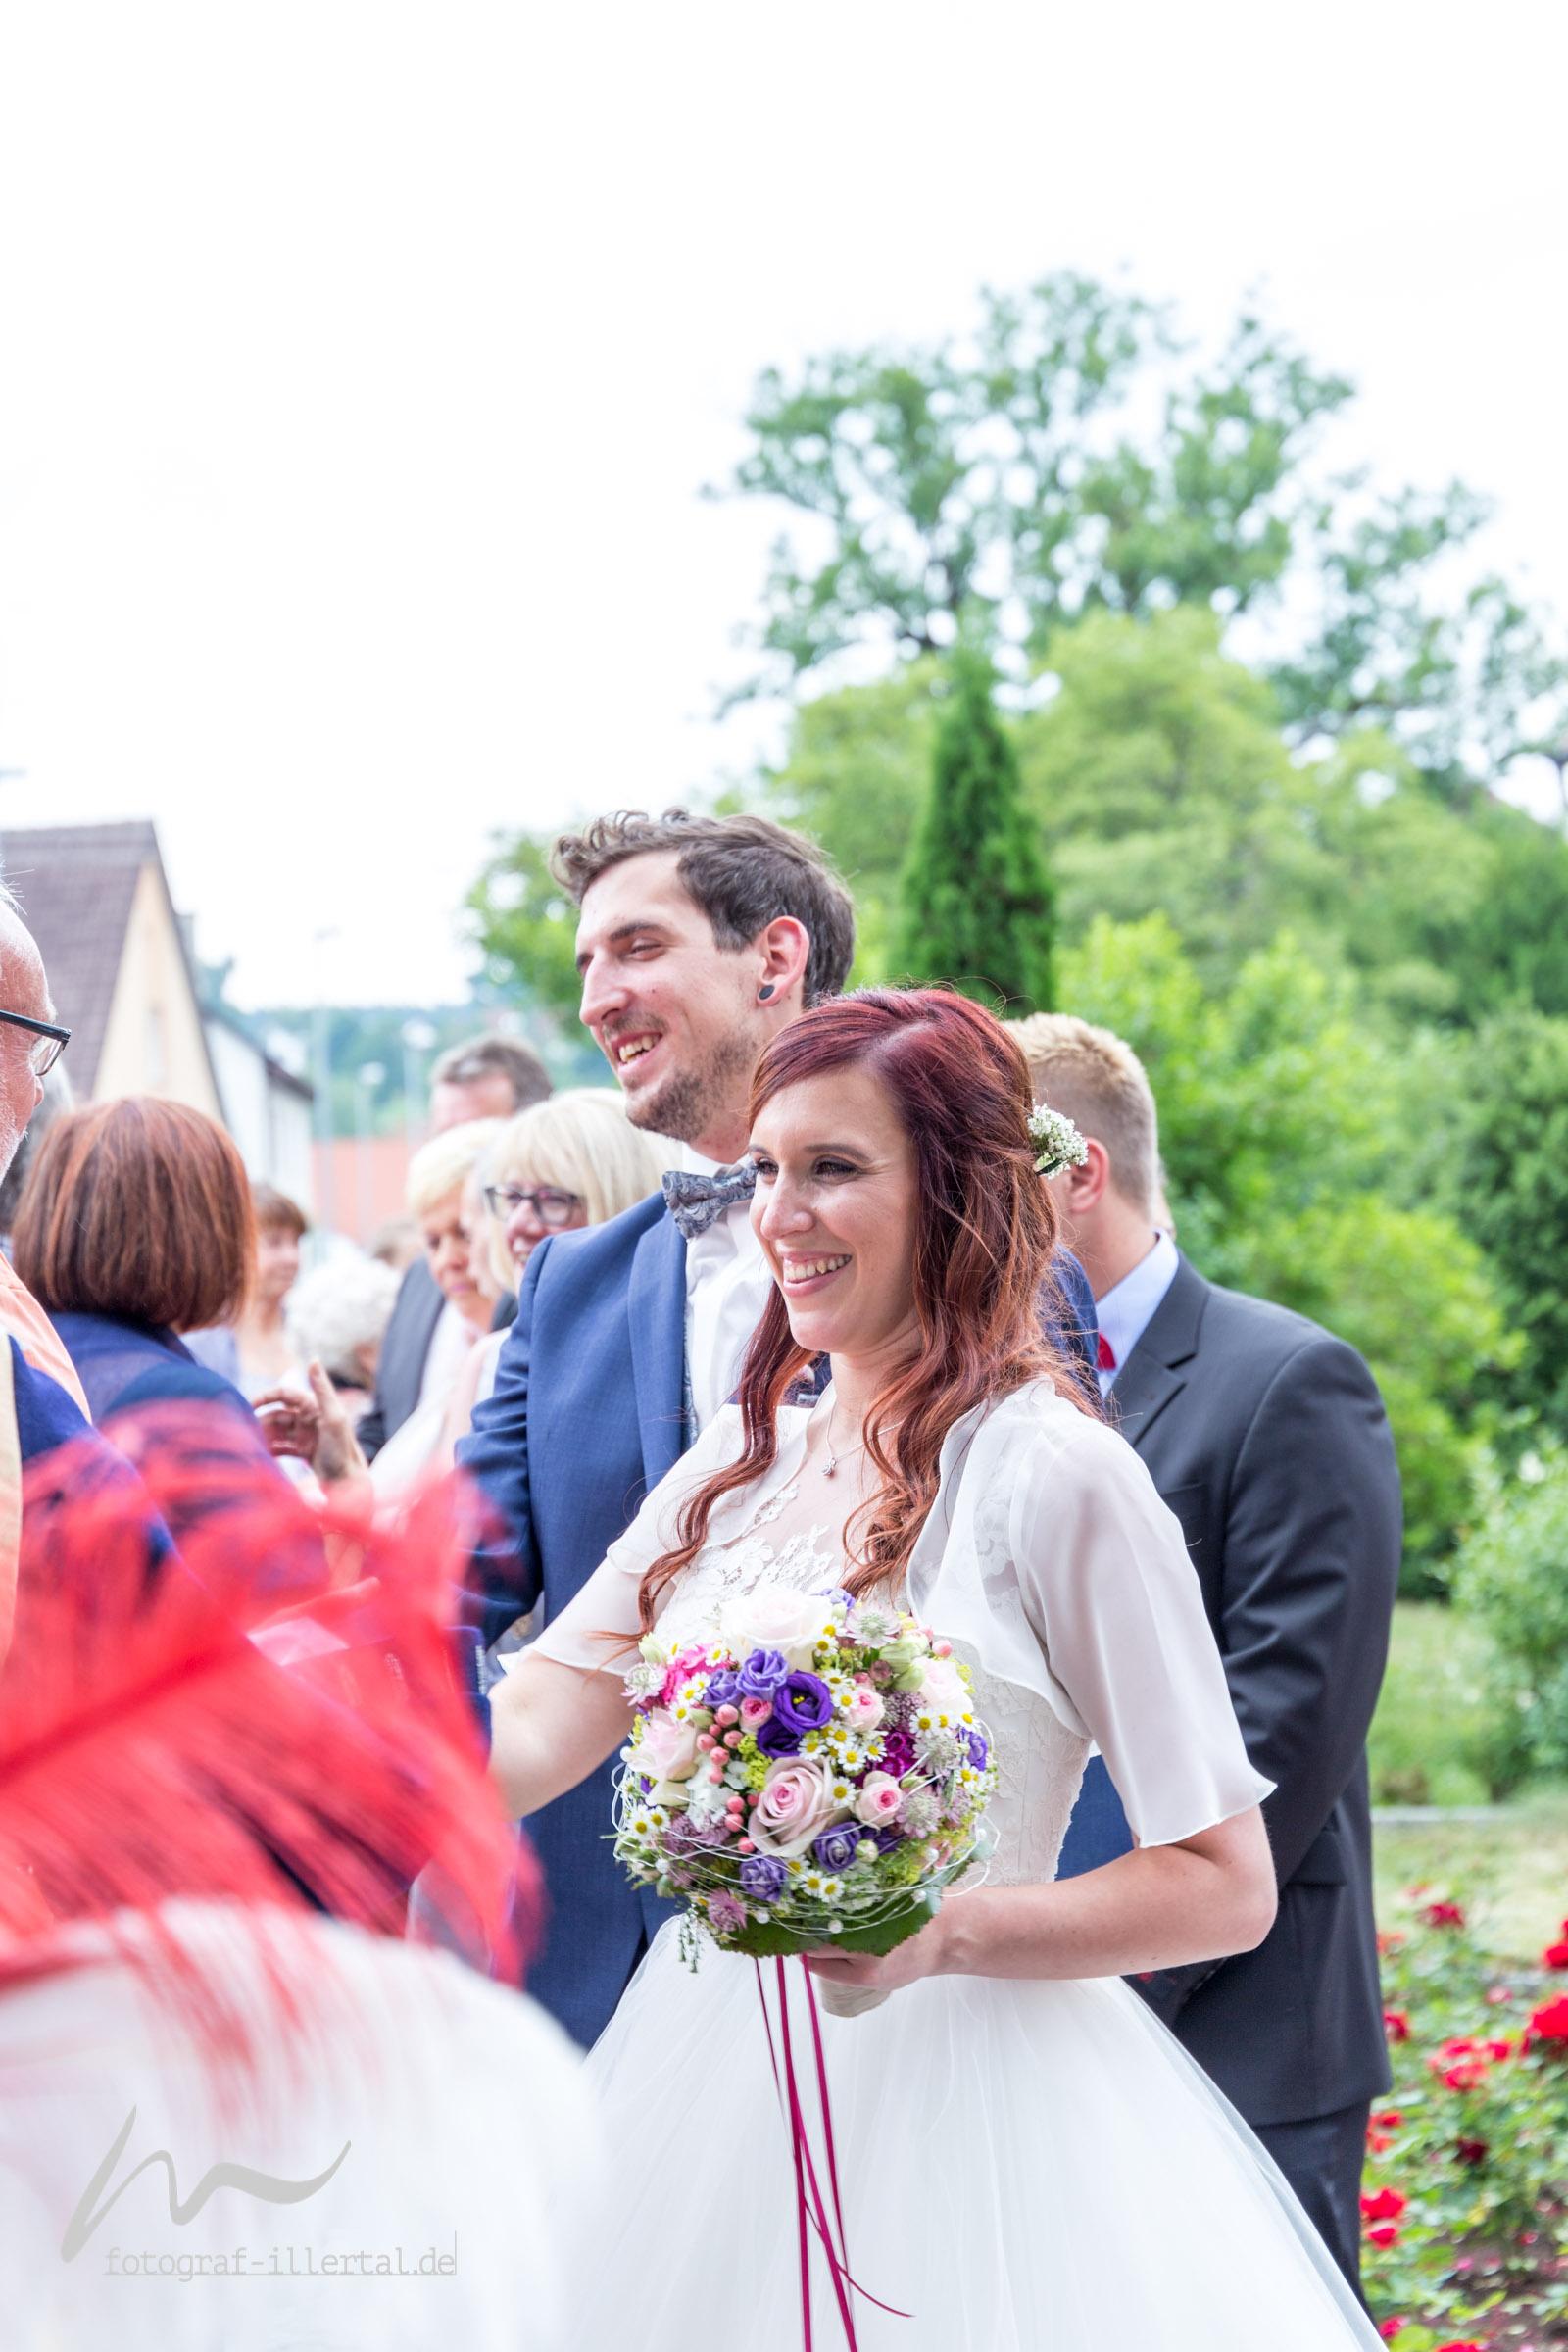 Fotograf Illertal-Christian Miller-Hochzeitsfotografie-_MG_2402